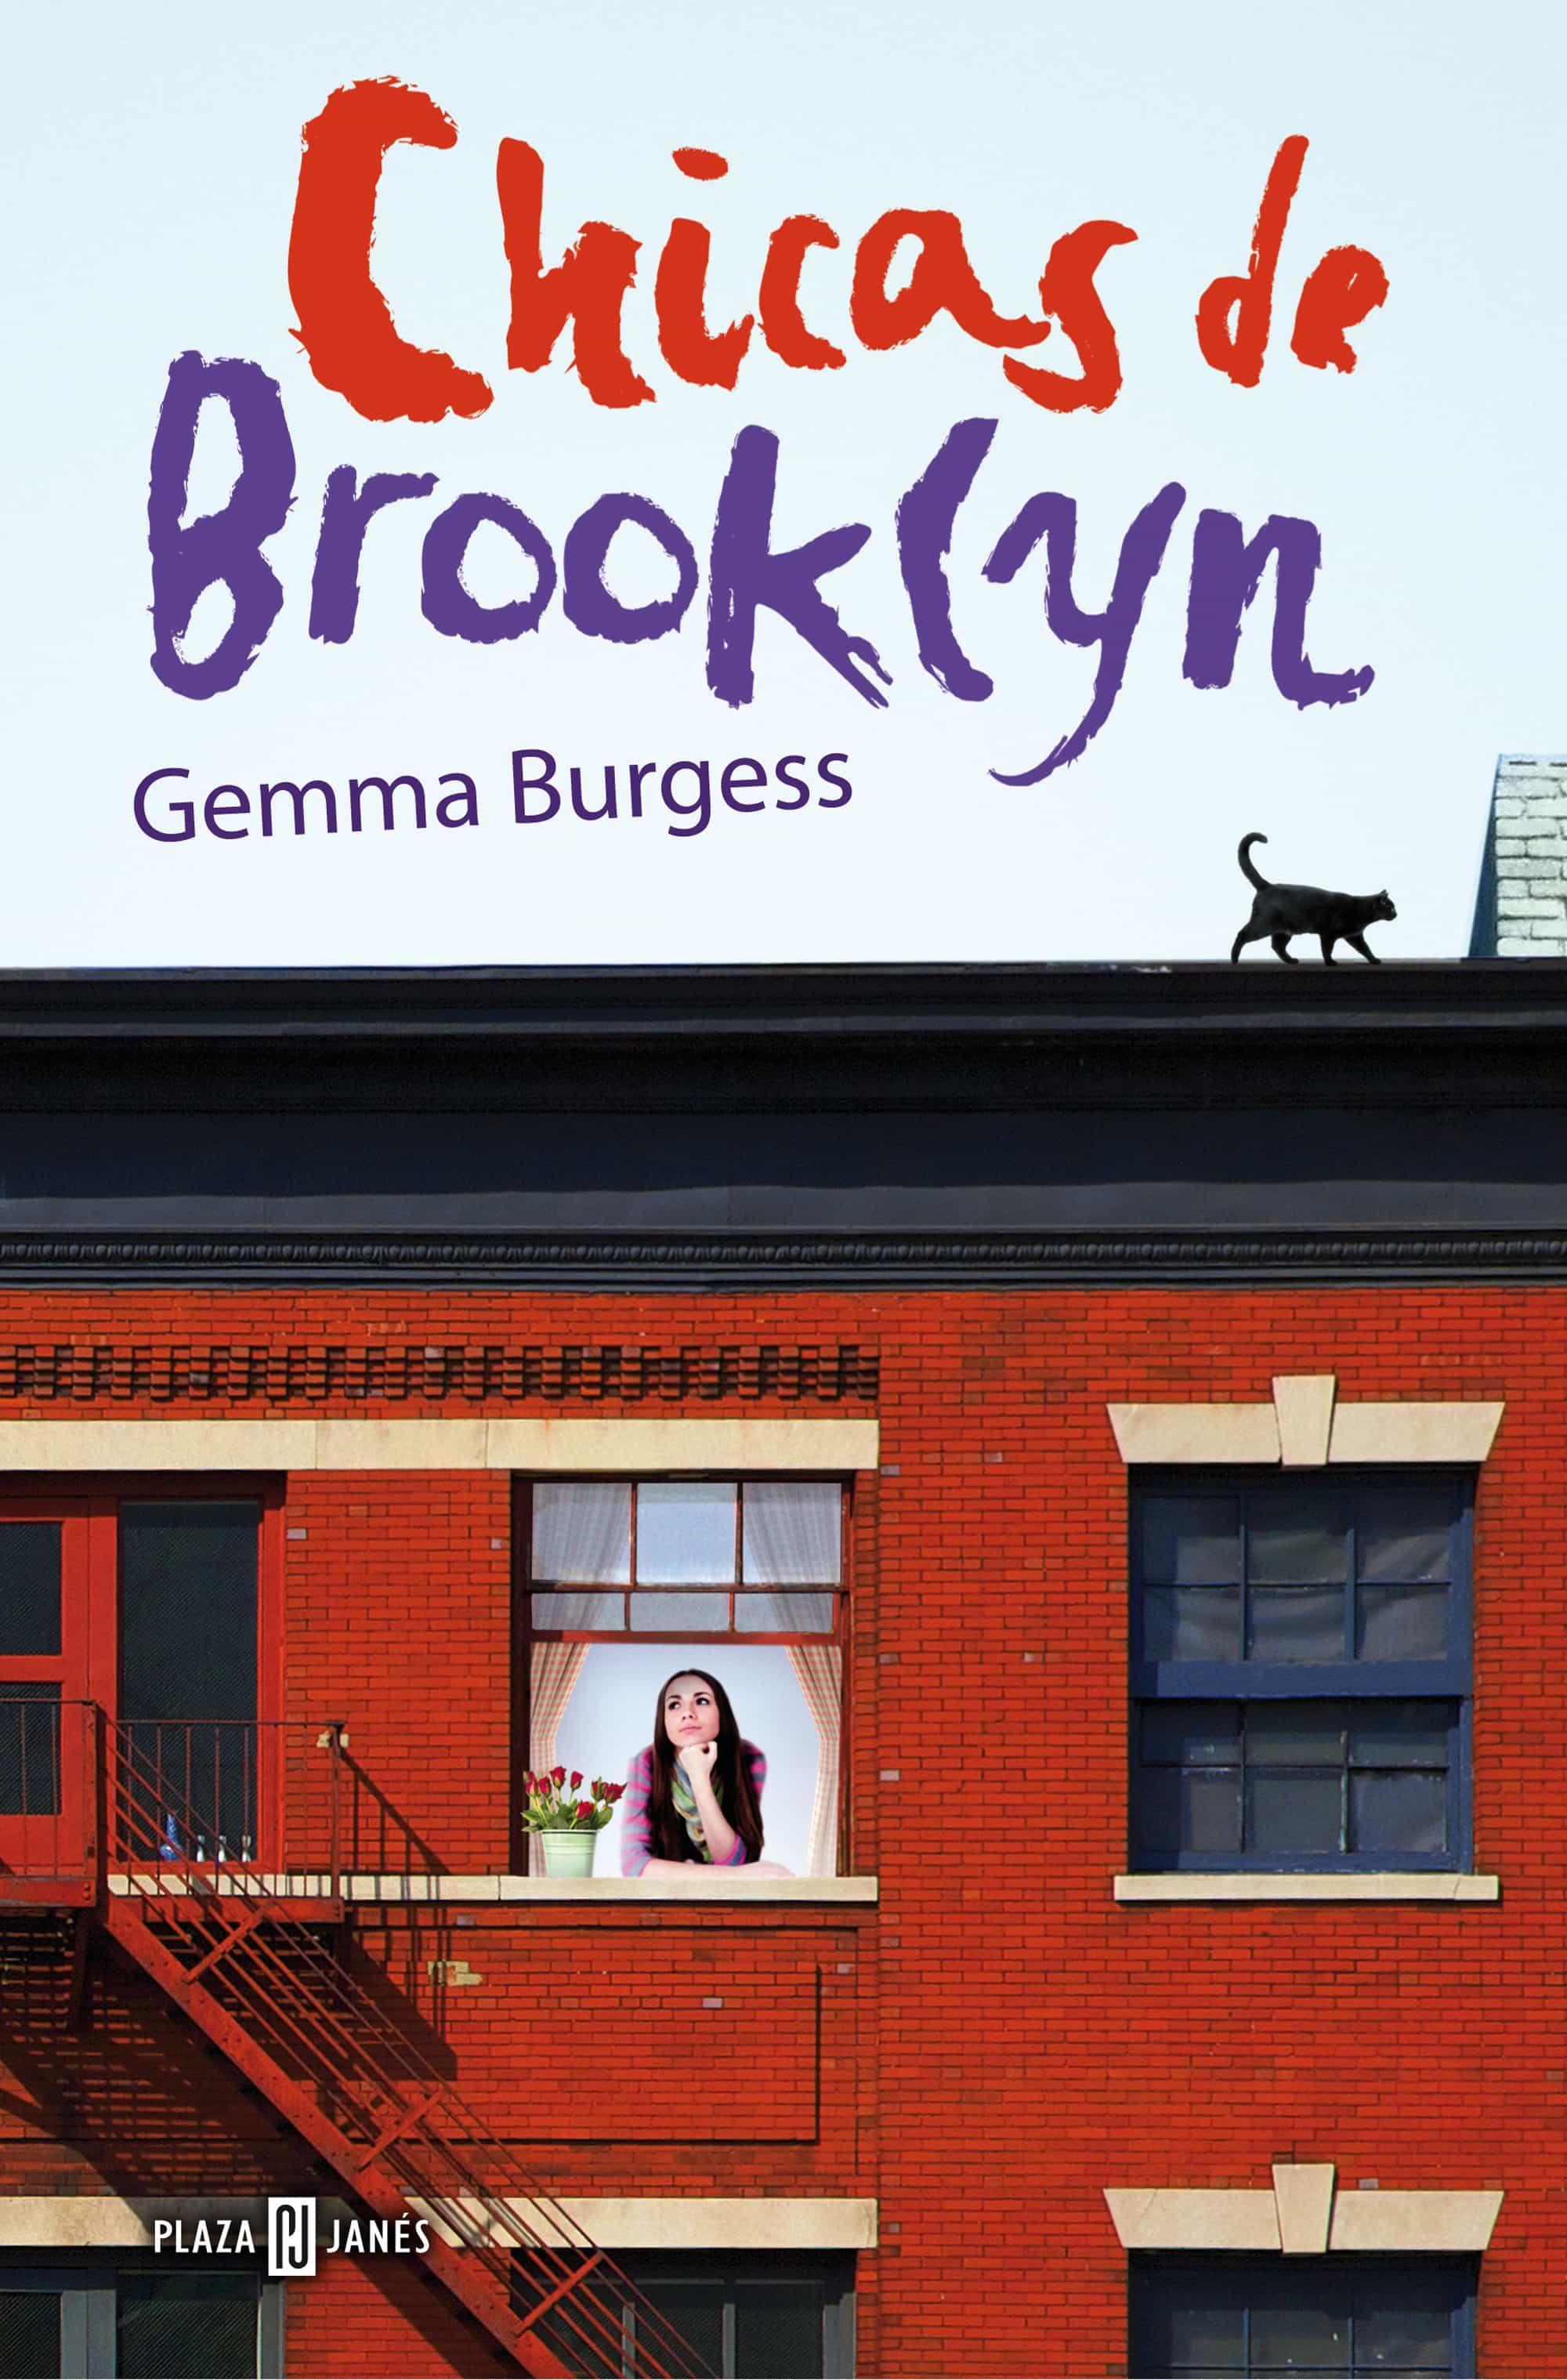 Chicas de Brooklyn - Chicas de Brooklyn 01, Gemma Burgess (rom) 9788401343254